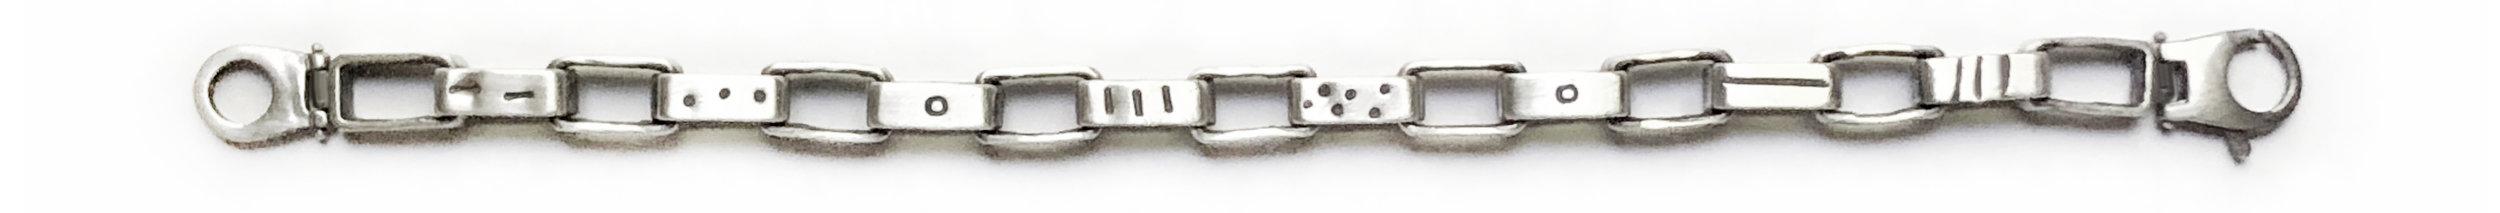 heavy box chain sterling silver dots lines tribal bracelet.JPG